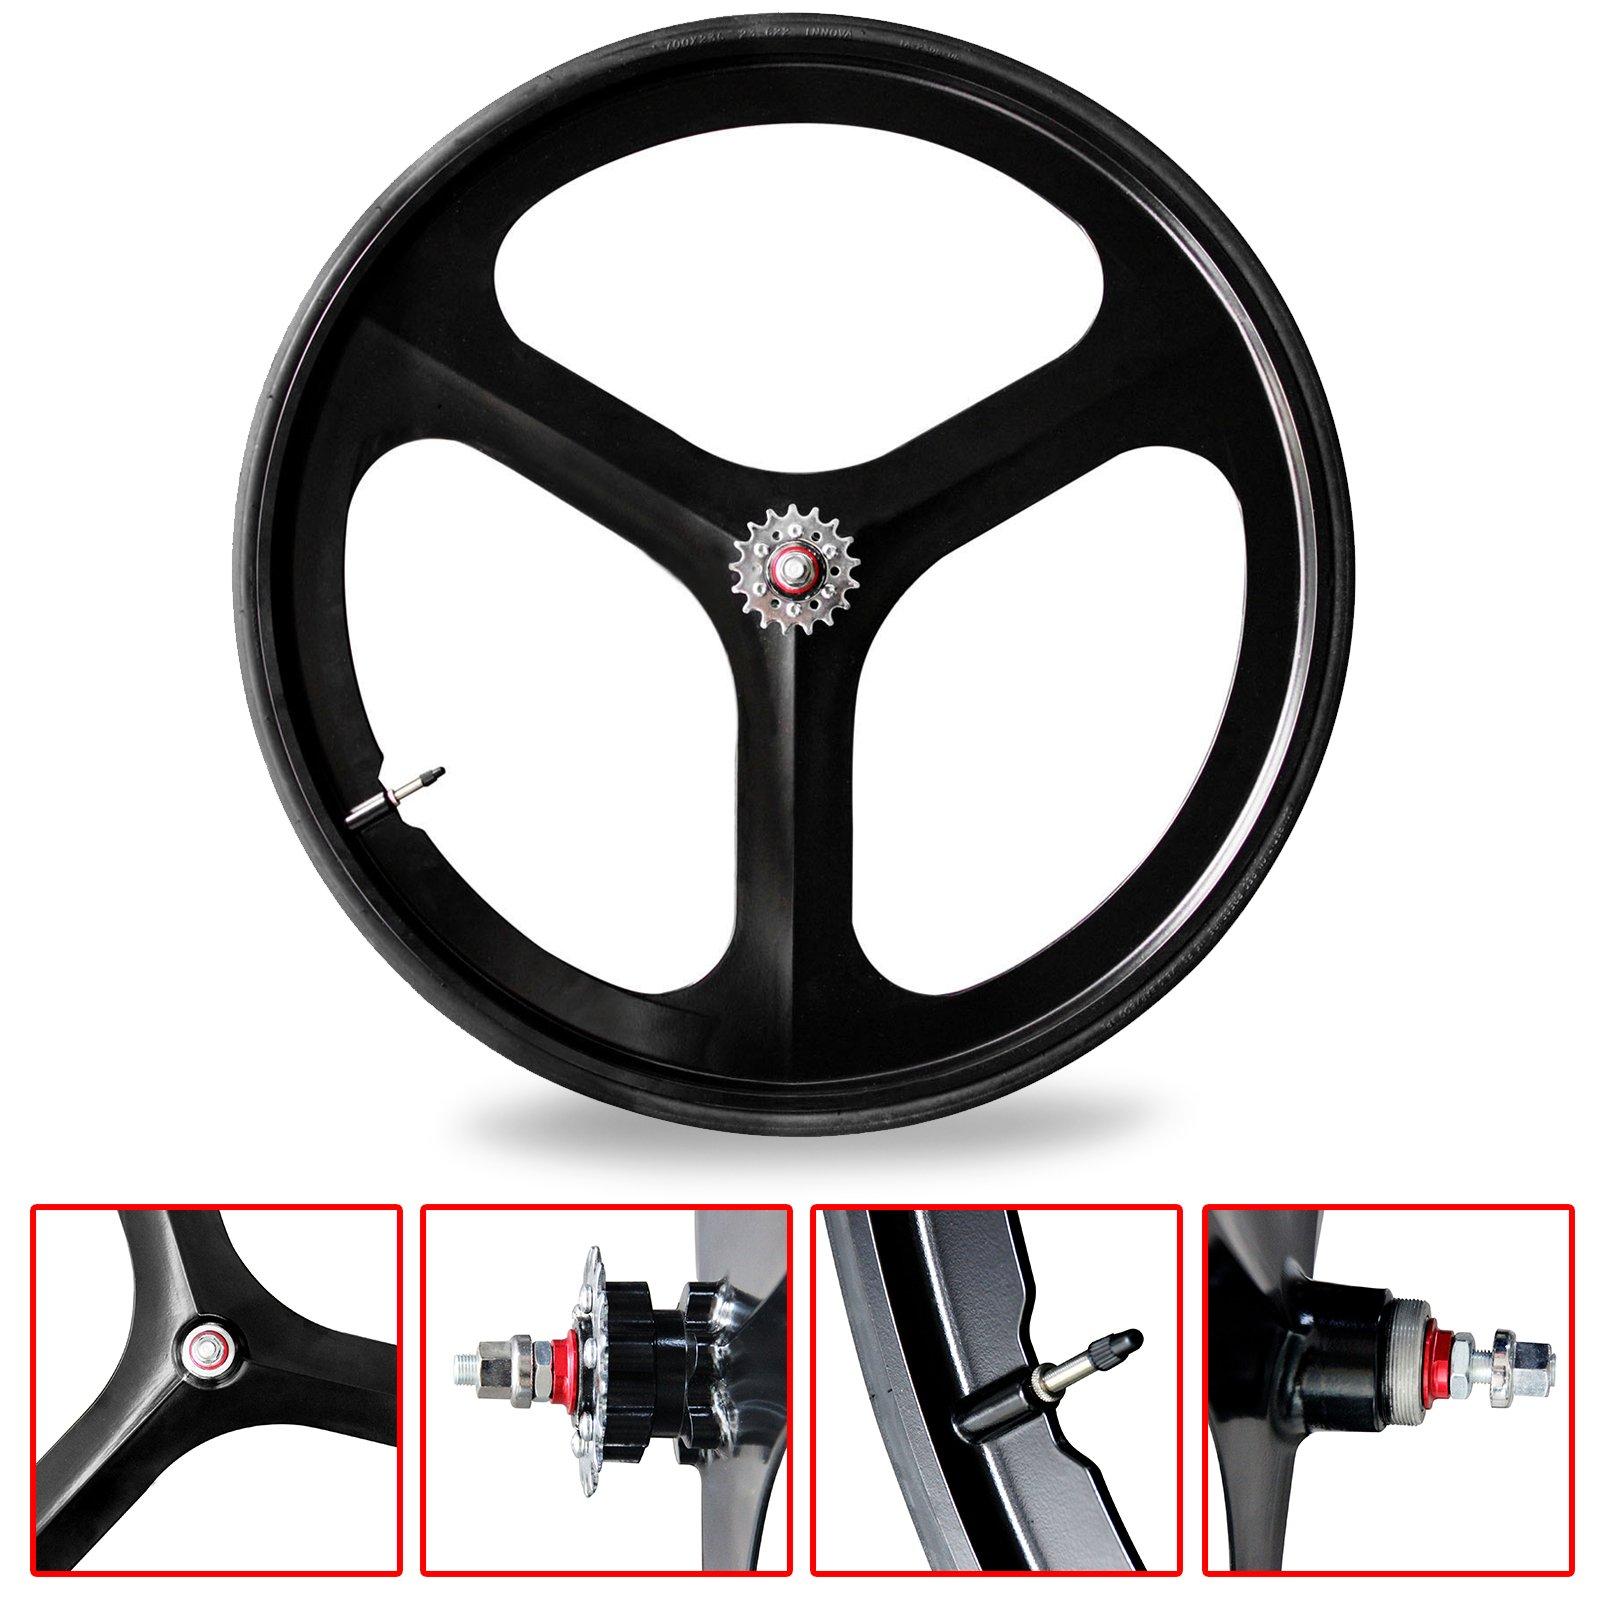 SOLOMONE CAVALLI Black SC Fixed Gear 700c Tri Spoke Rim Rear Single Speed Fixie Bicycle Wheel by SOLOMONE CAVALLI